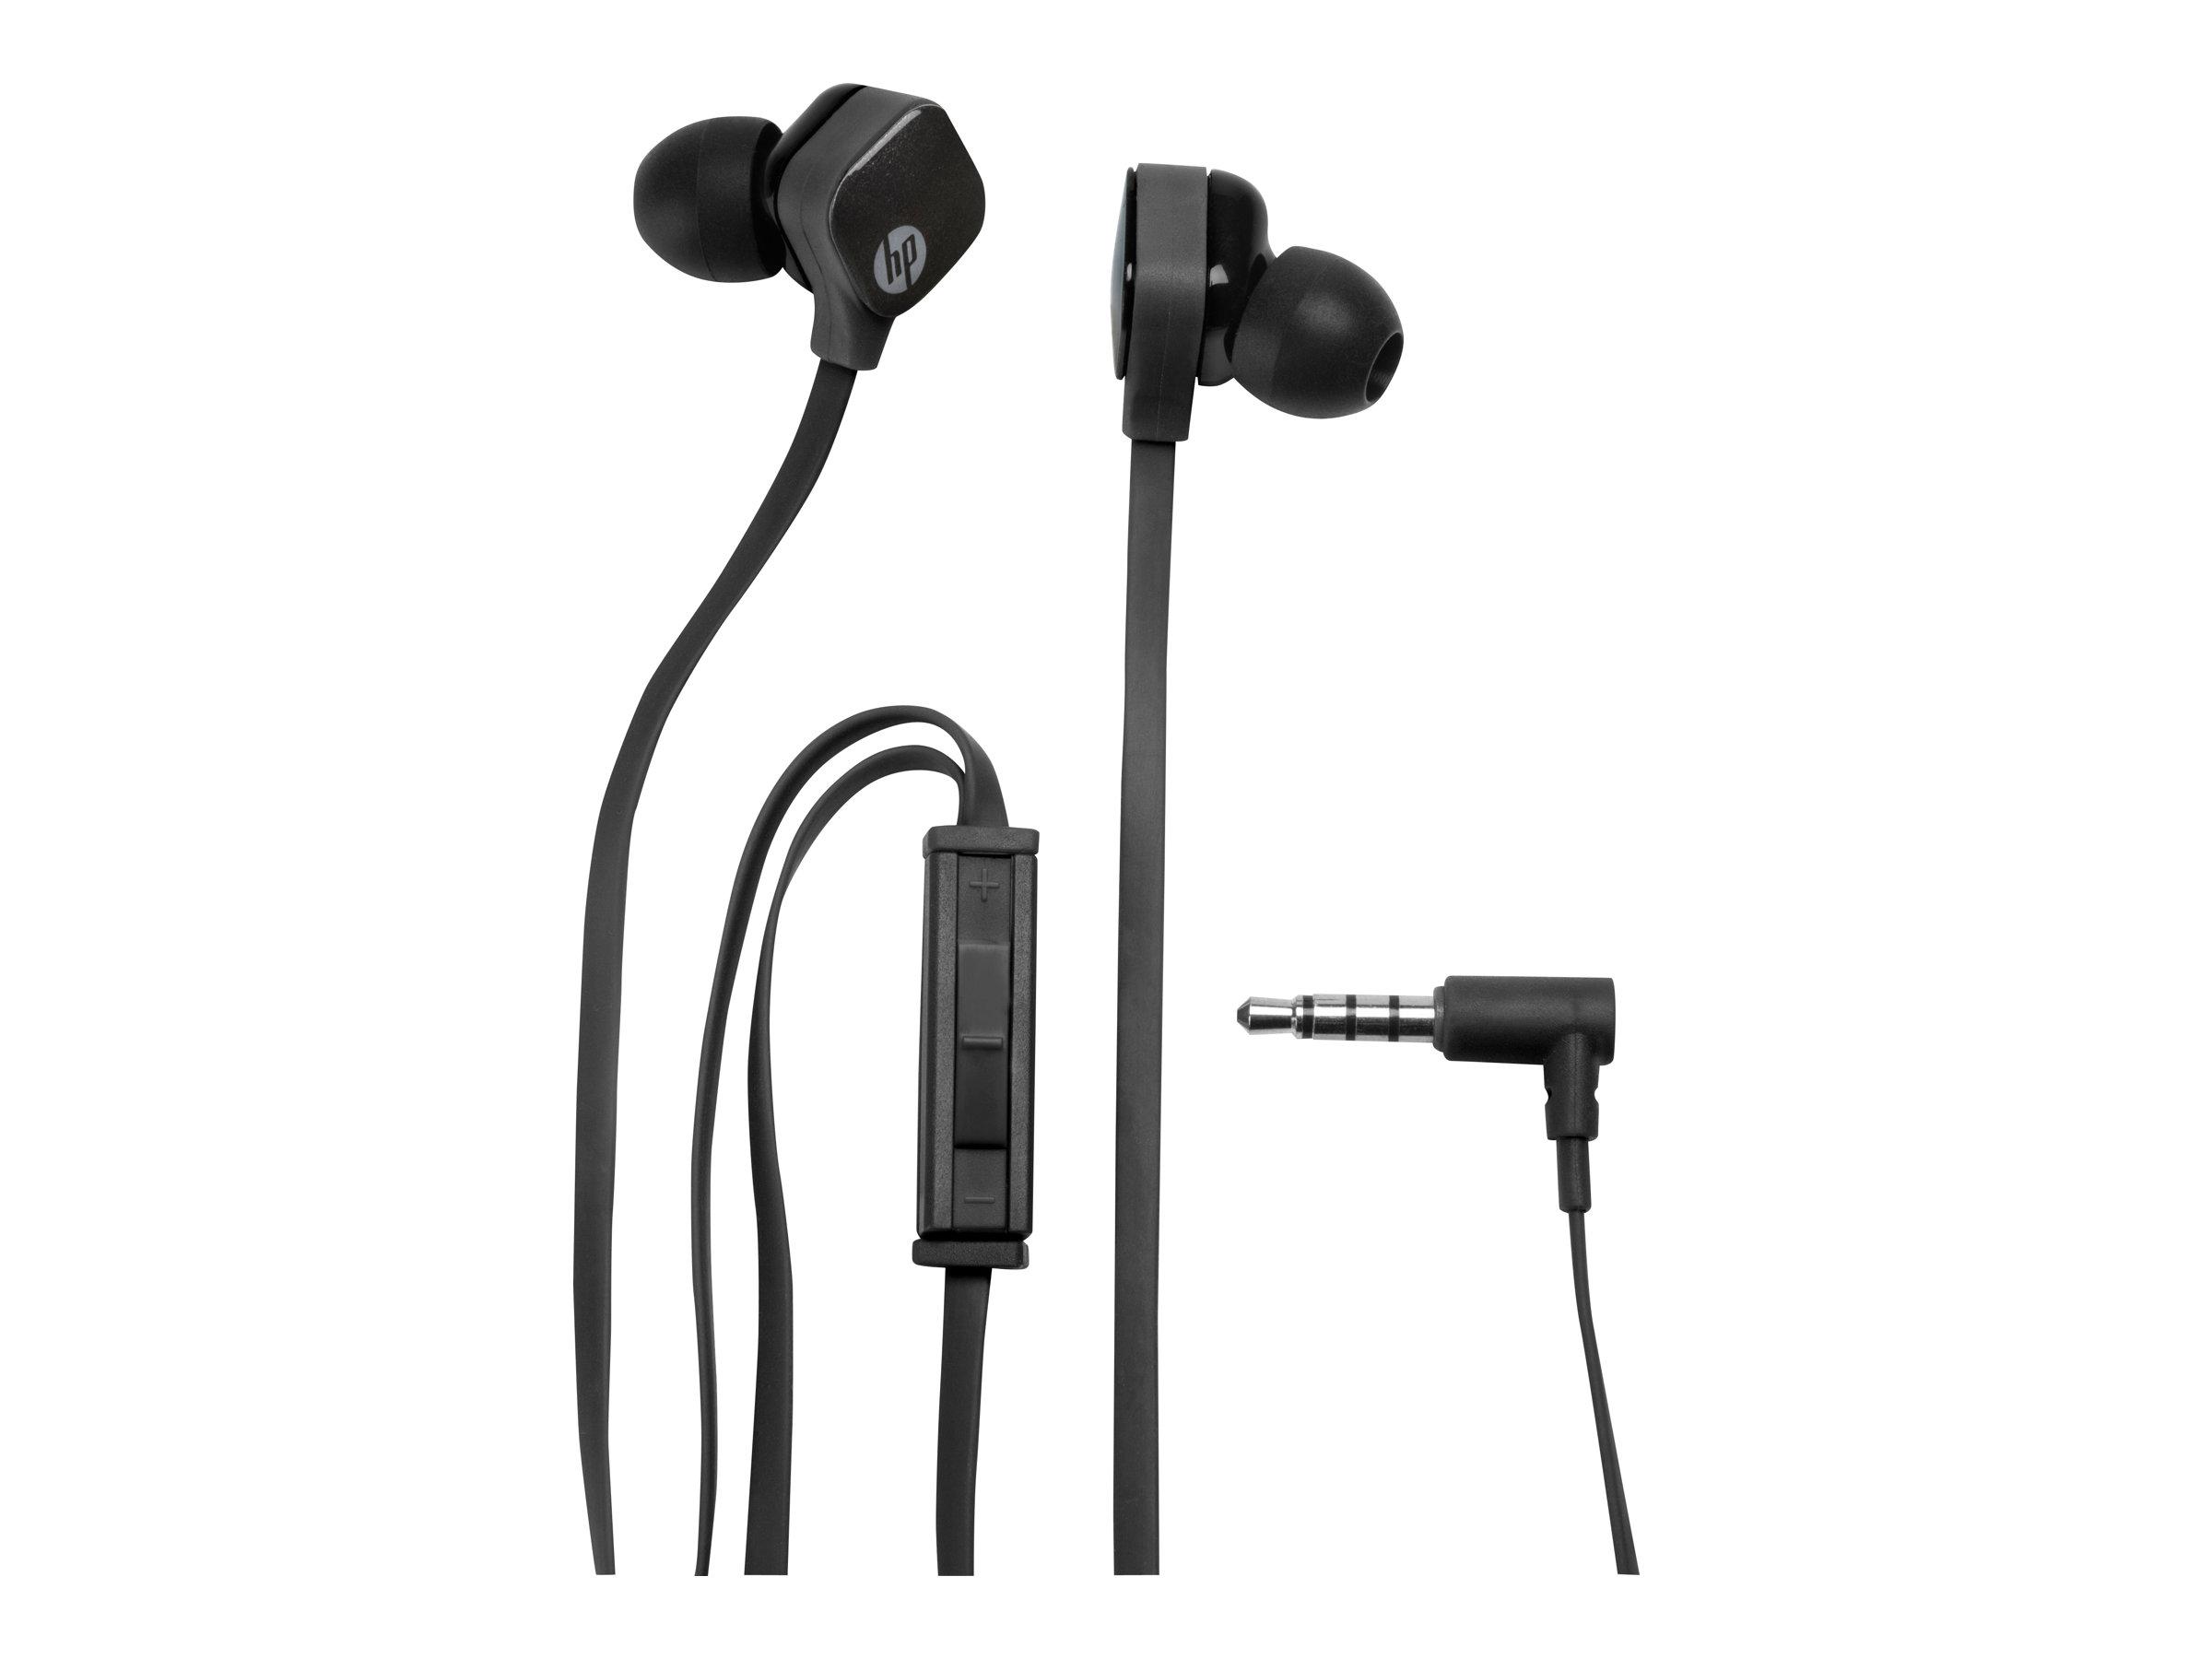 HP H2310 - Headset - im Ohr - kabelgebunden - Sparkling Black - für OMEN by HP 15; OMEN Obelisk by HP 875; HP 14; Envy 17; ENVY